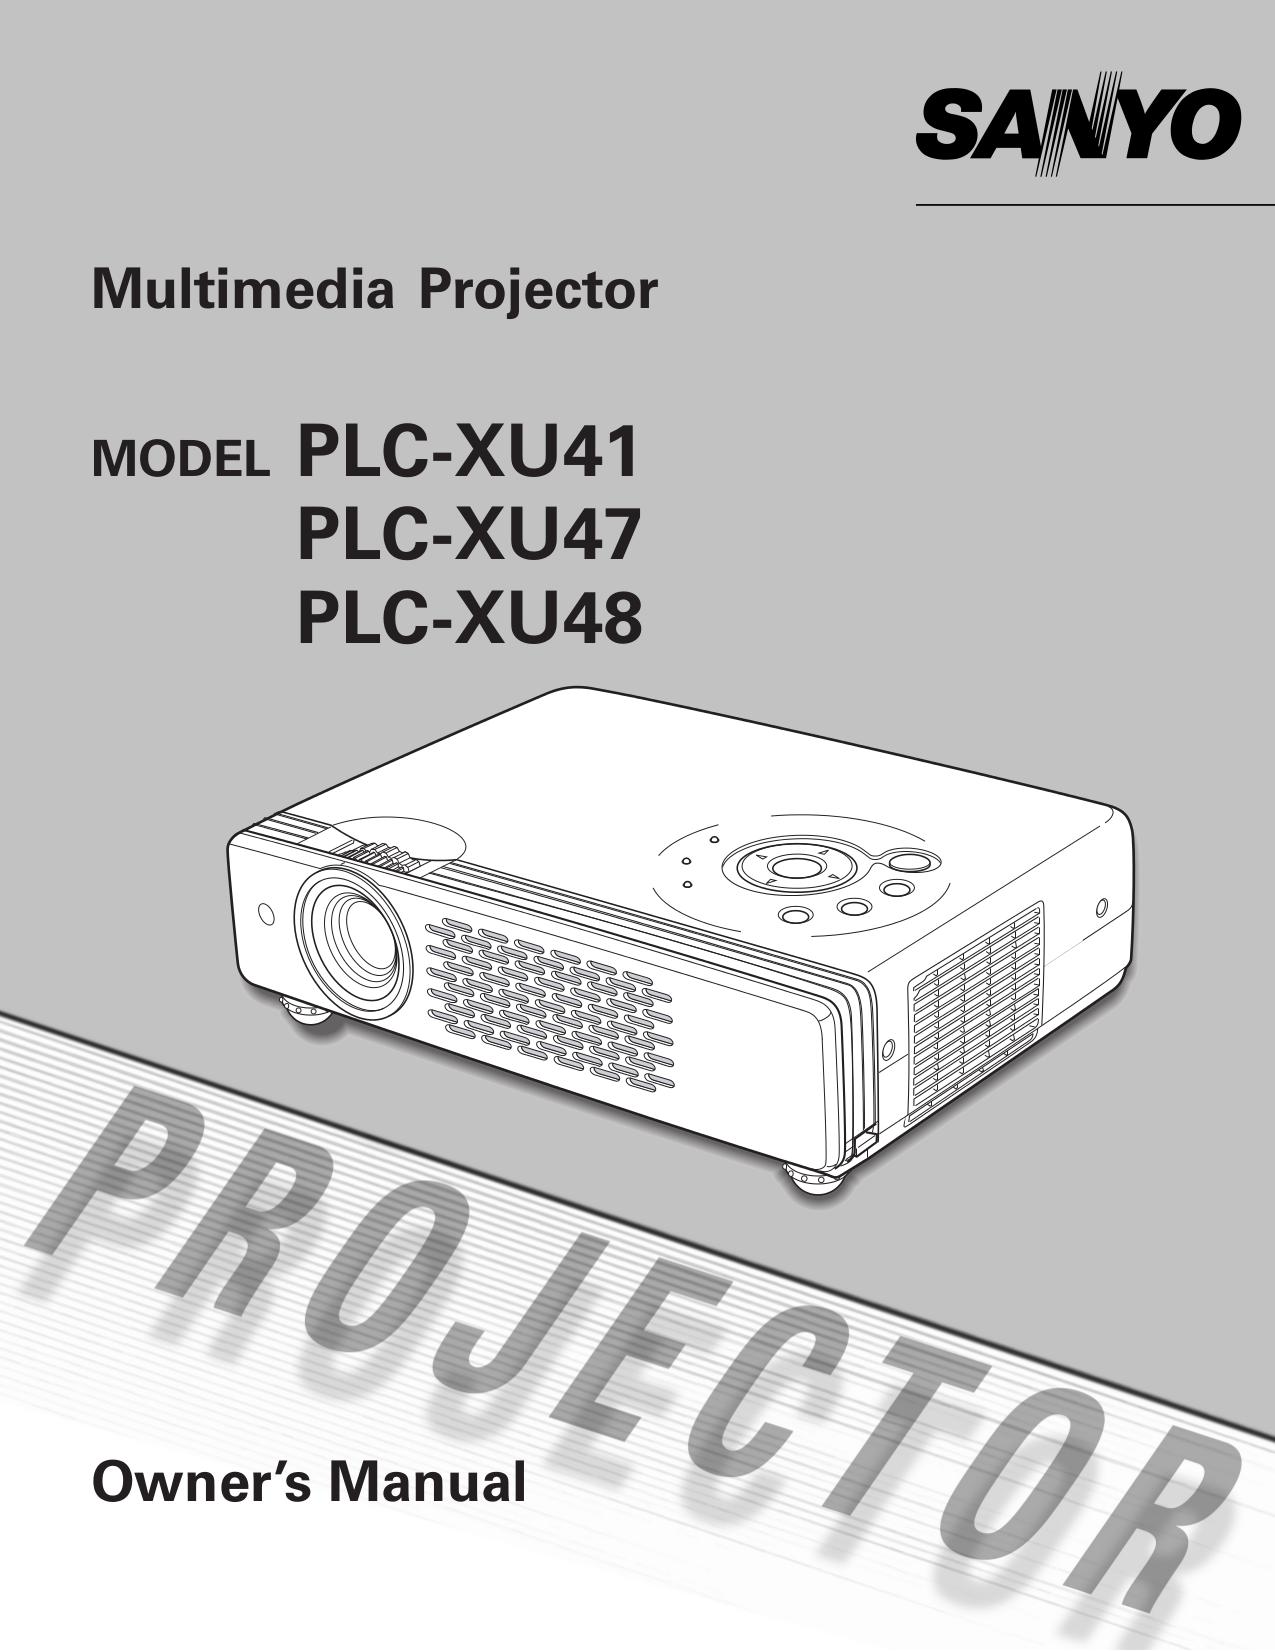 Sanyo Plc Xu48 Manual Epub Download Free Schematics Eeprom Repair Info For Electronics Answered